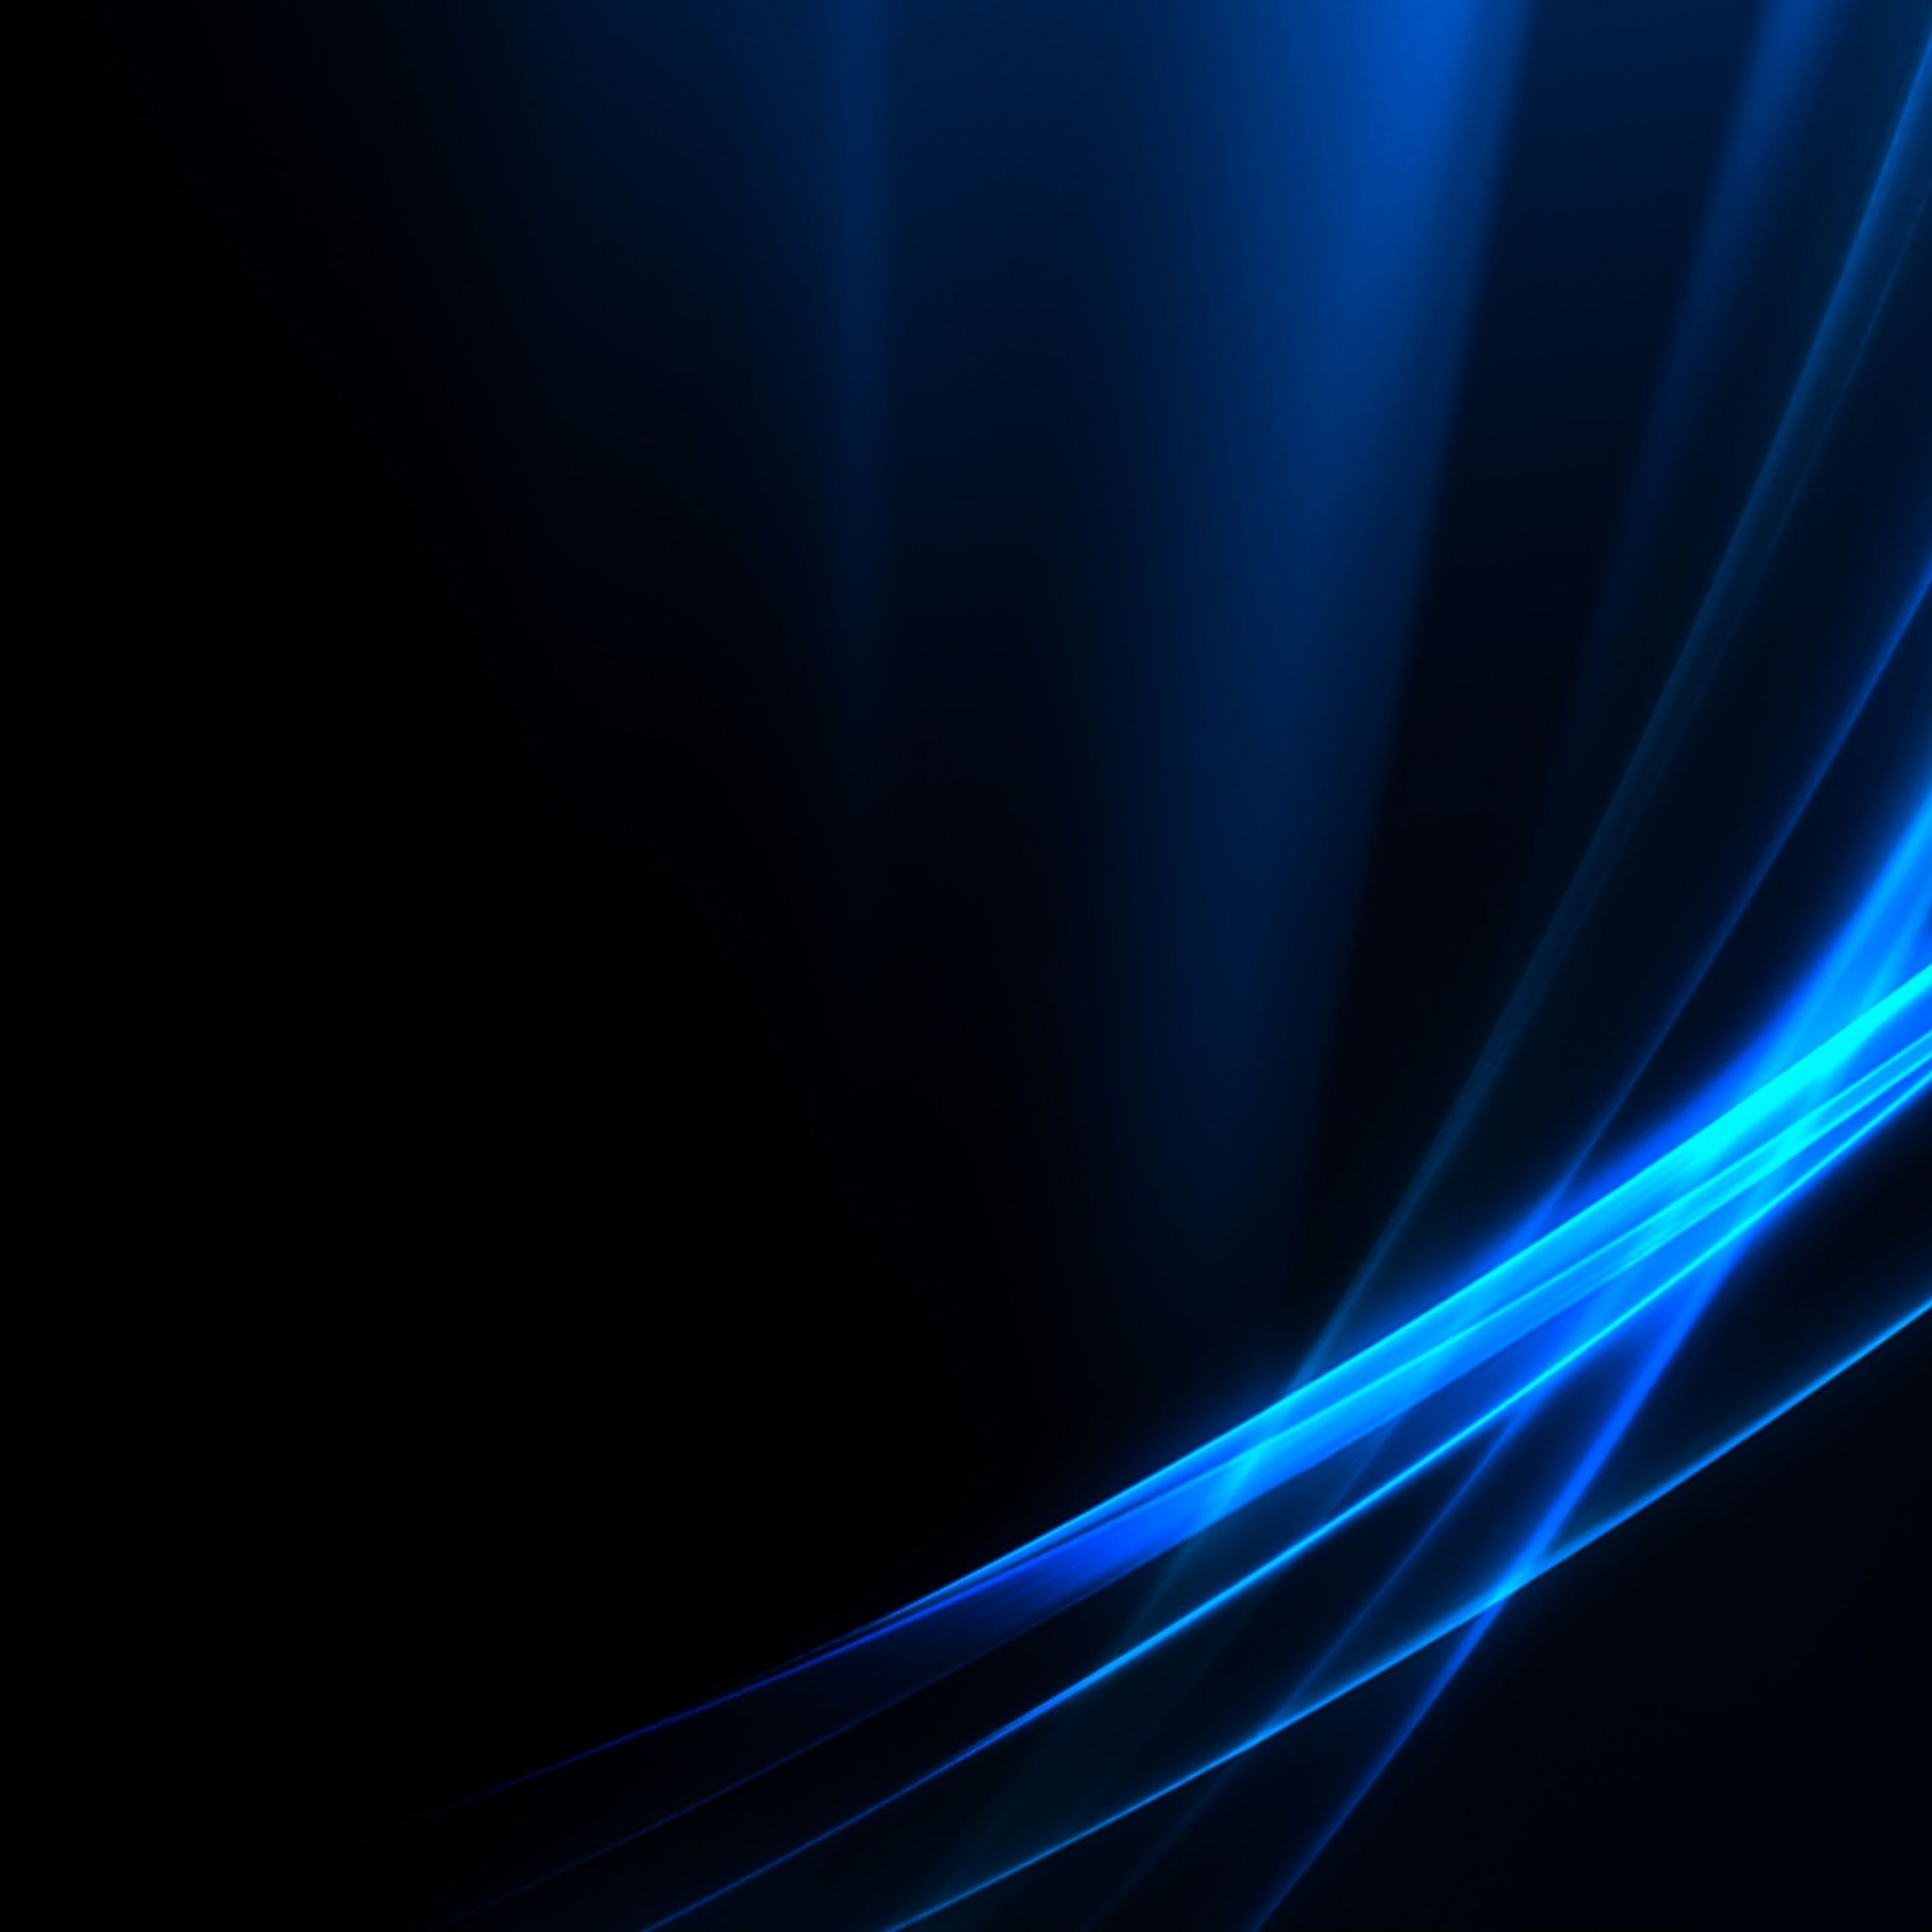 Neon Blue Wallpapers ·①